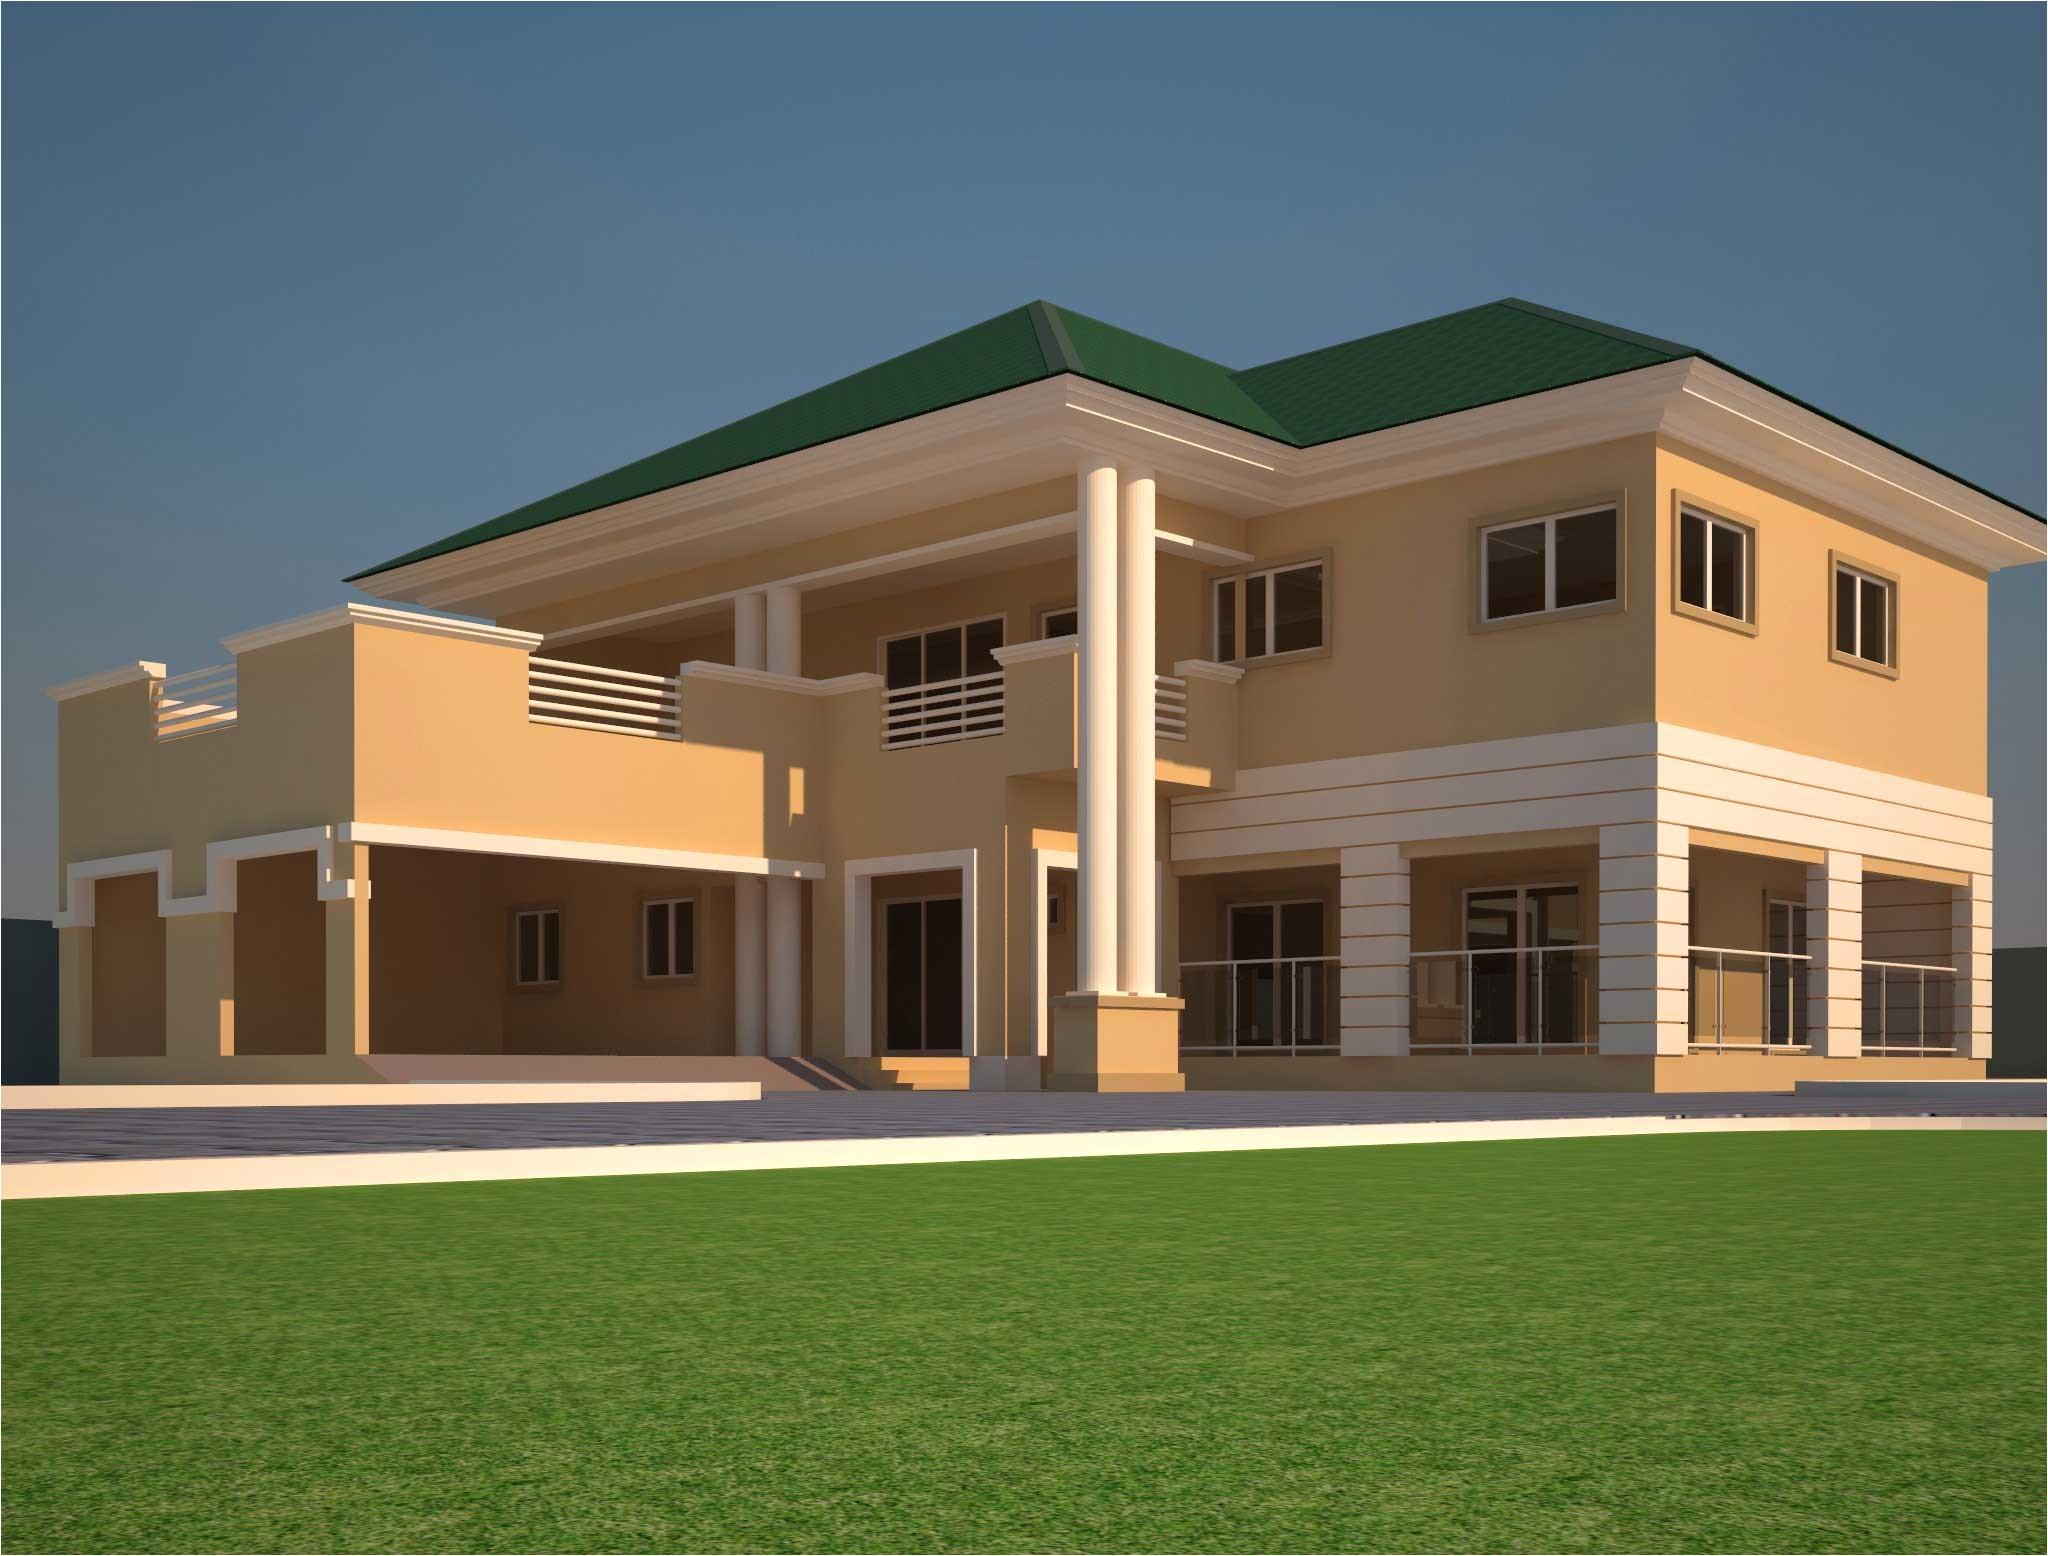 pompam 5 bedroom house plan 2